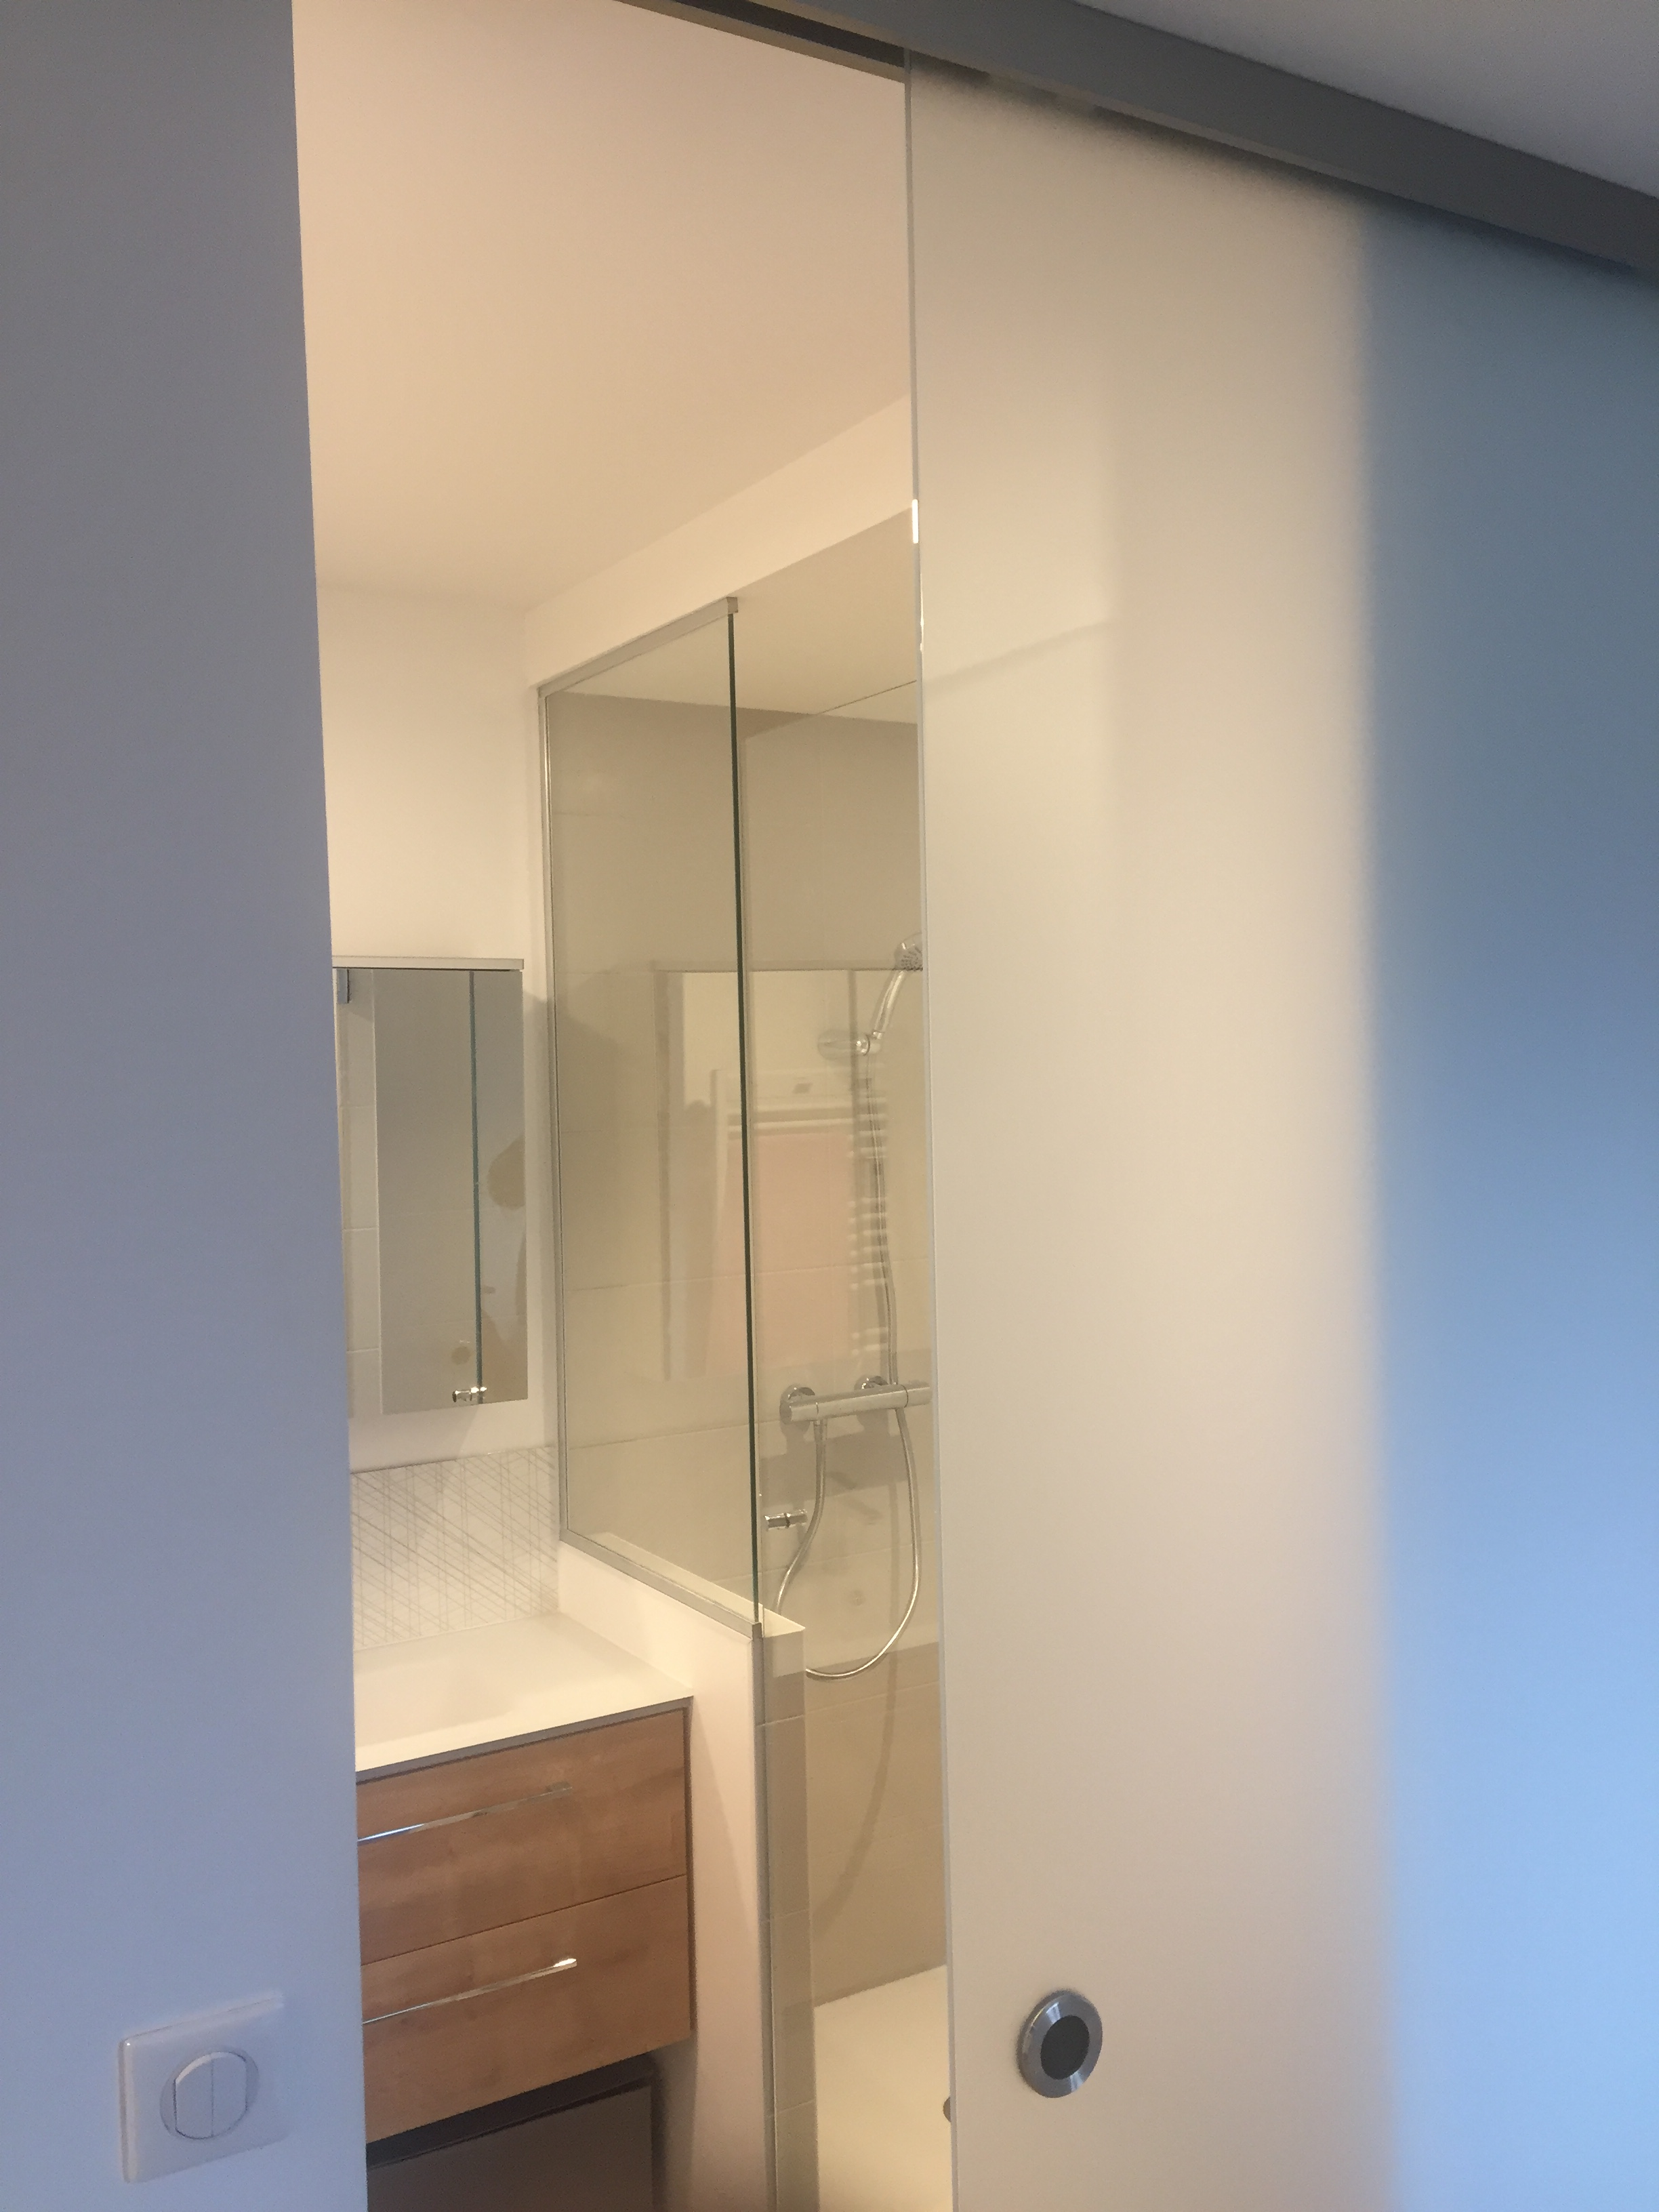 porte en verre d poli coulissante atelier du verre cr ations. Black Bedroom Furniture Sets. Home Design Ideas